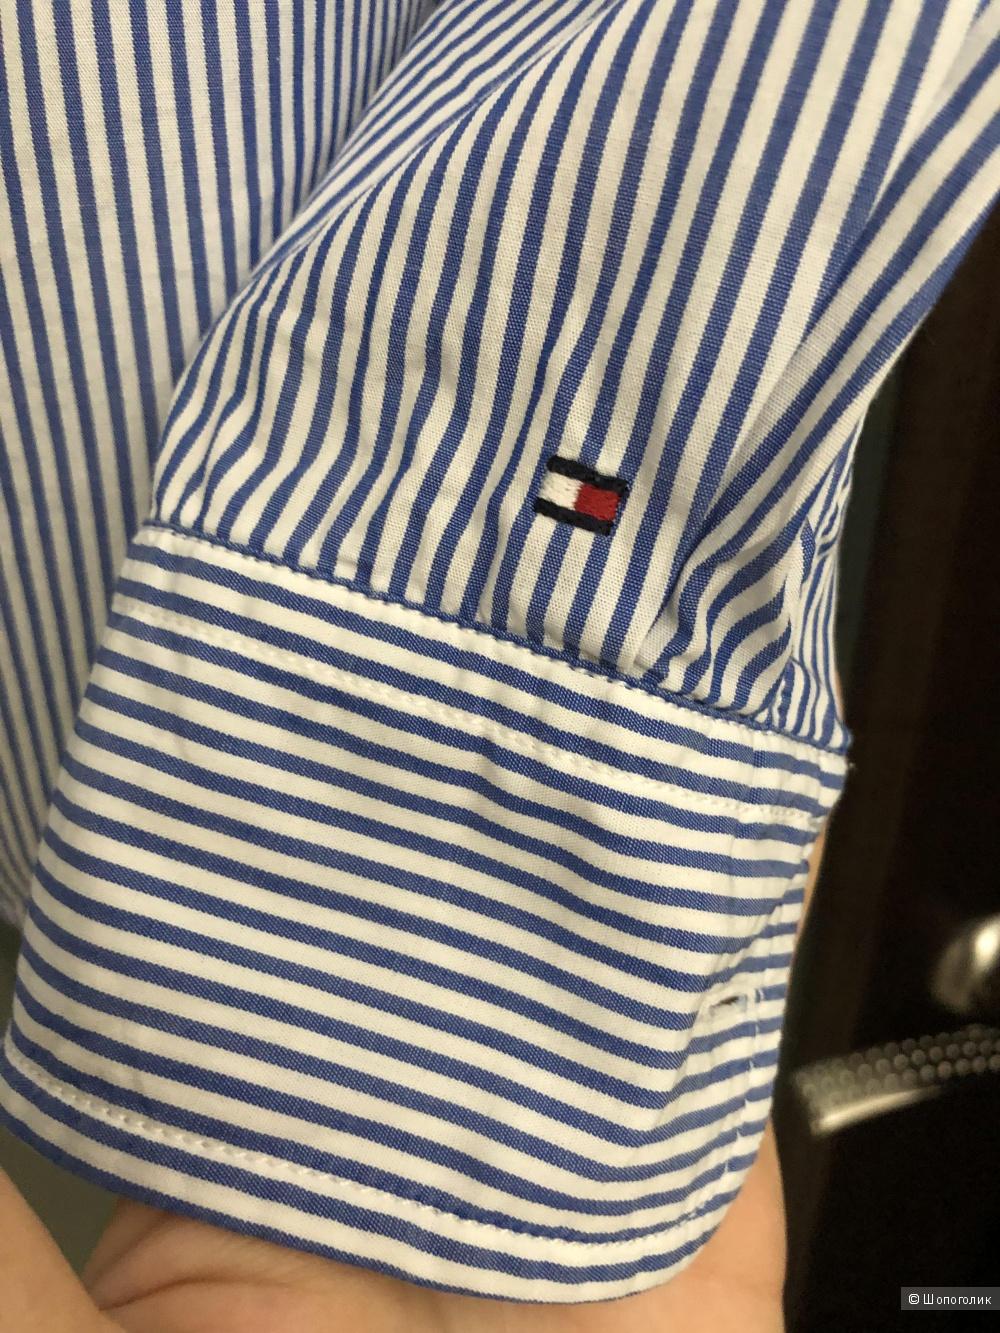 Рубашка Tommy Hilfiger S/M